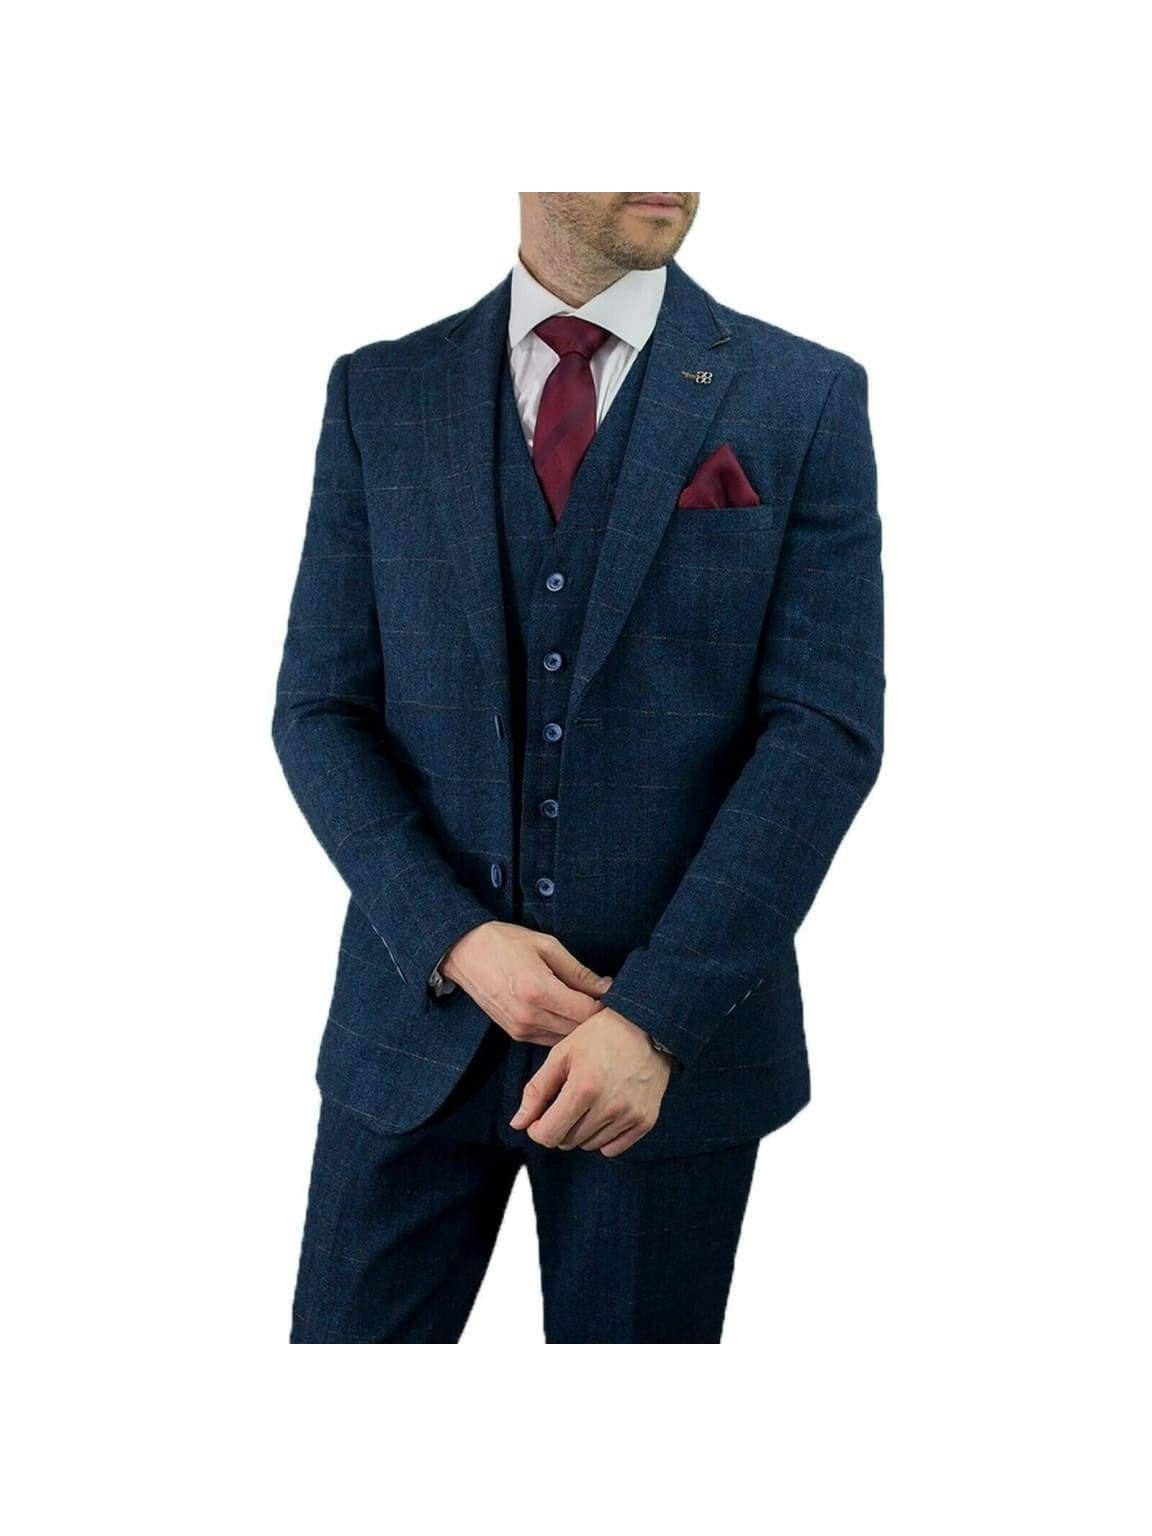 Cavani Carnegi 3 Piece Blue Check Tweed Suit - 36S / 30S - Suit & Tailoring